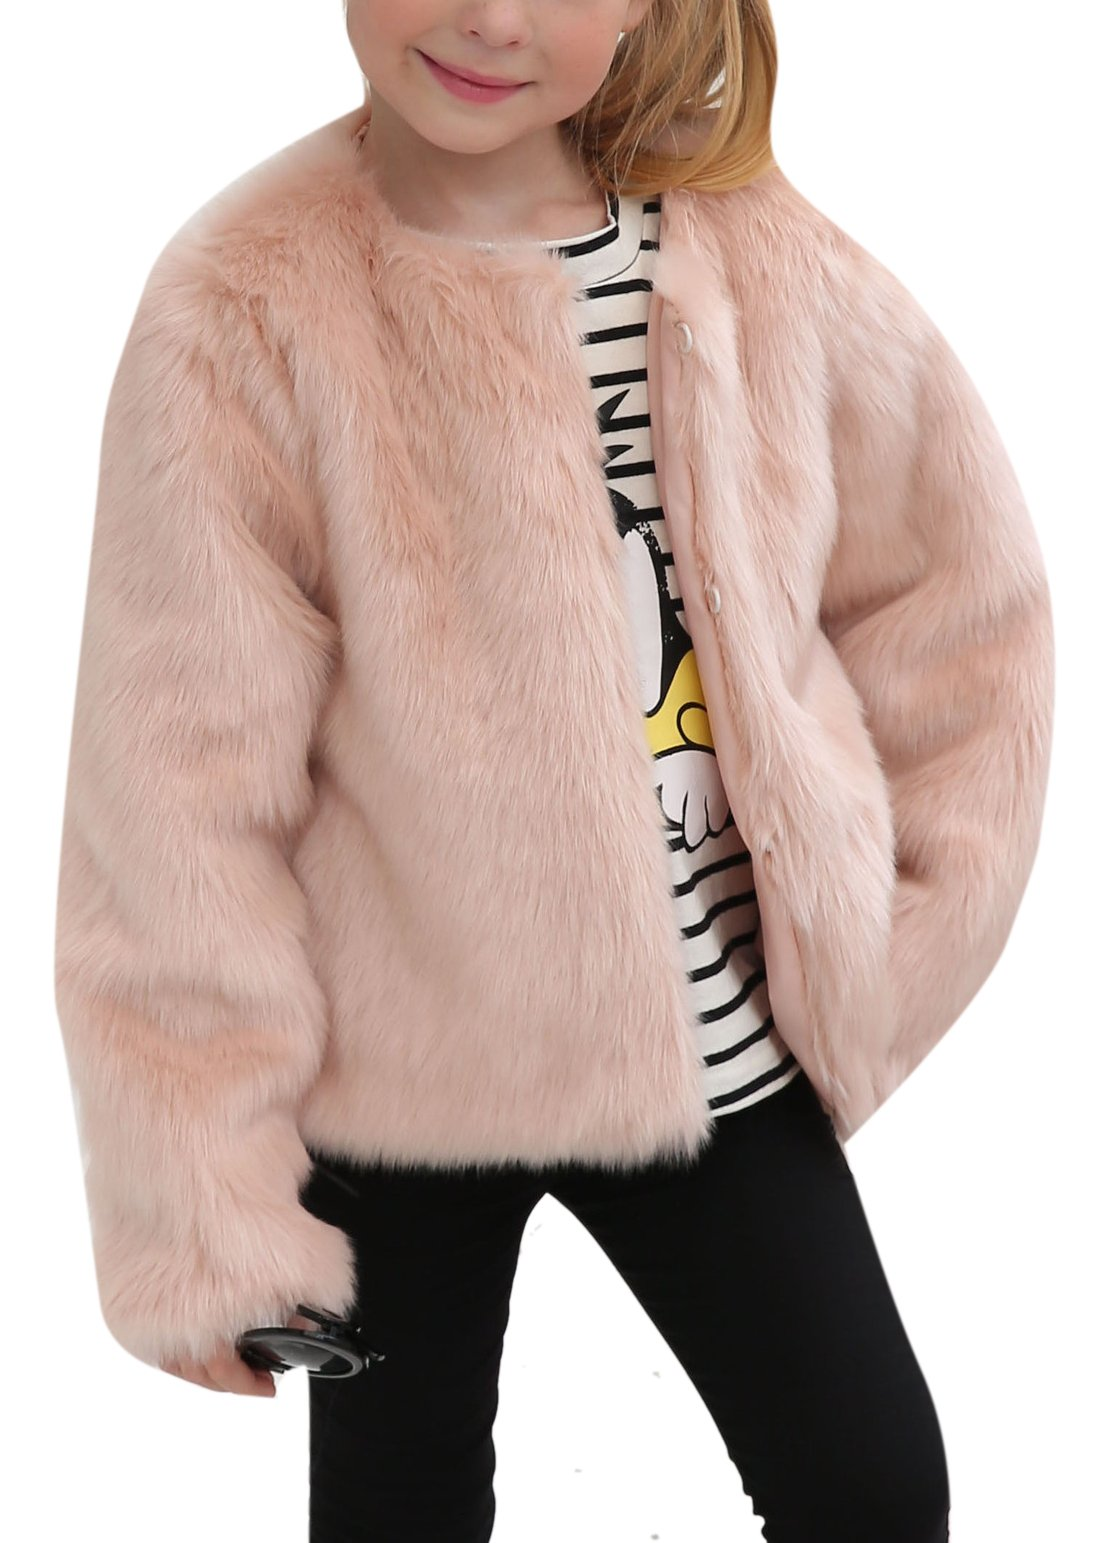 Girls Winter Warm Faux Fur Rabbit Fake Short Long Sleeve Coat Little Kids Outerwear 4-5 Years Light Pink